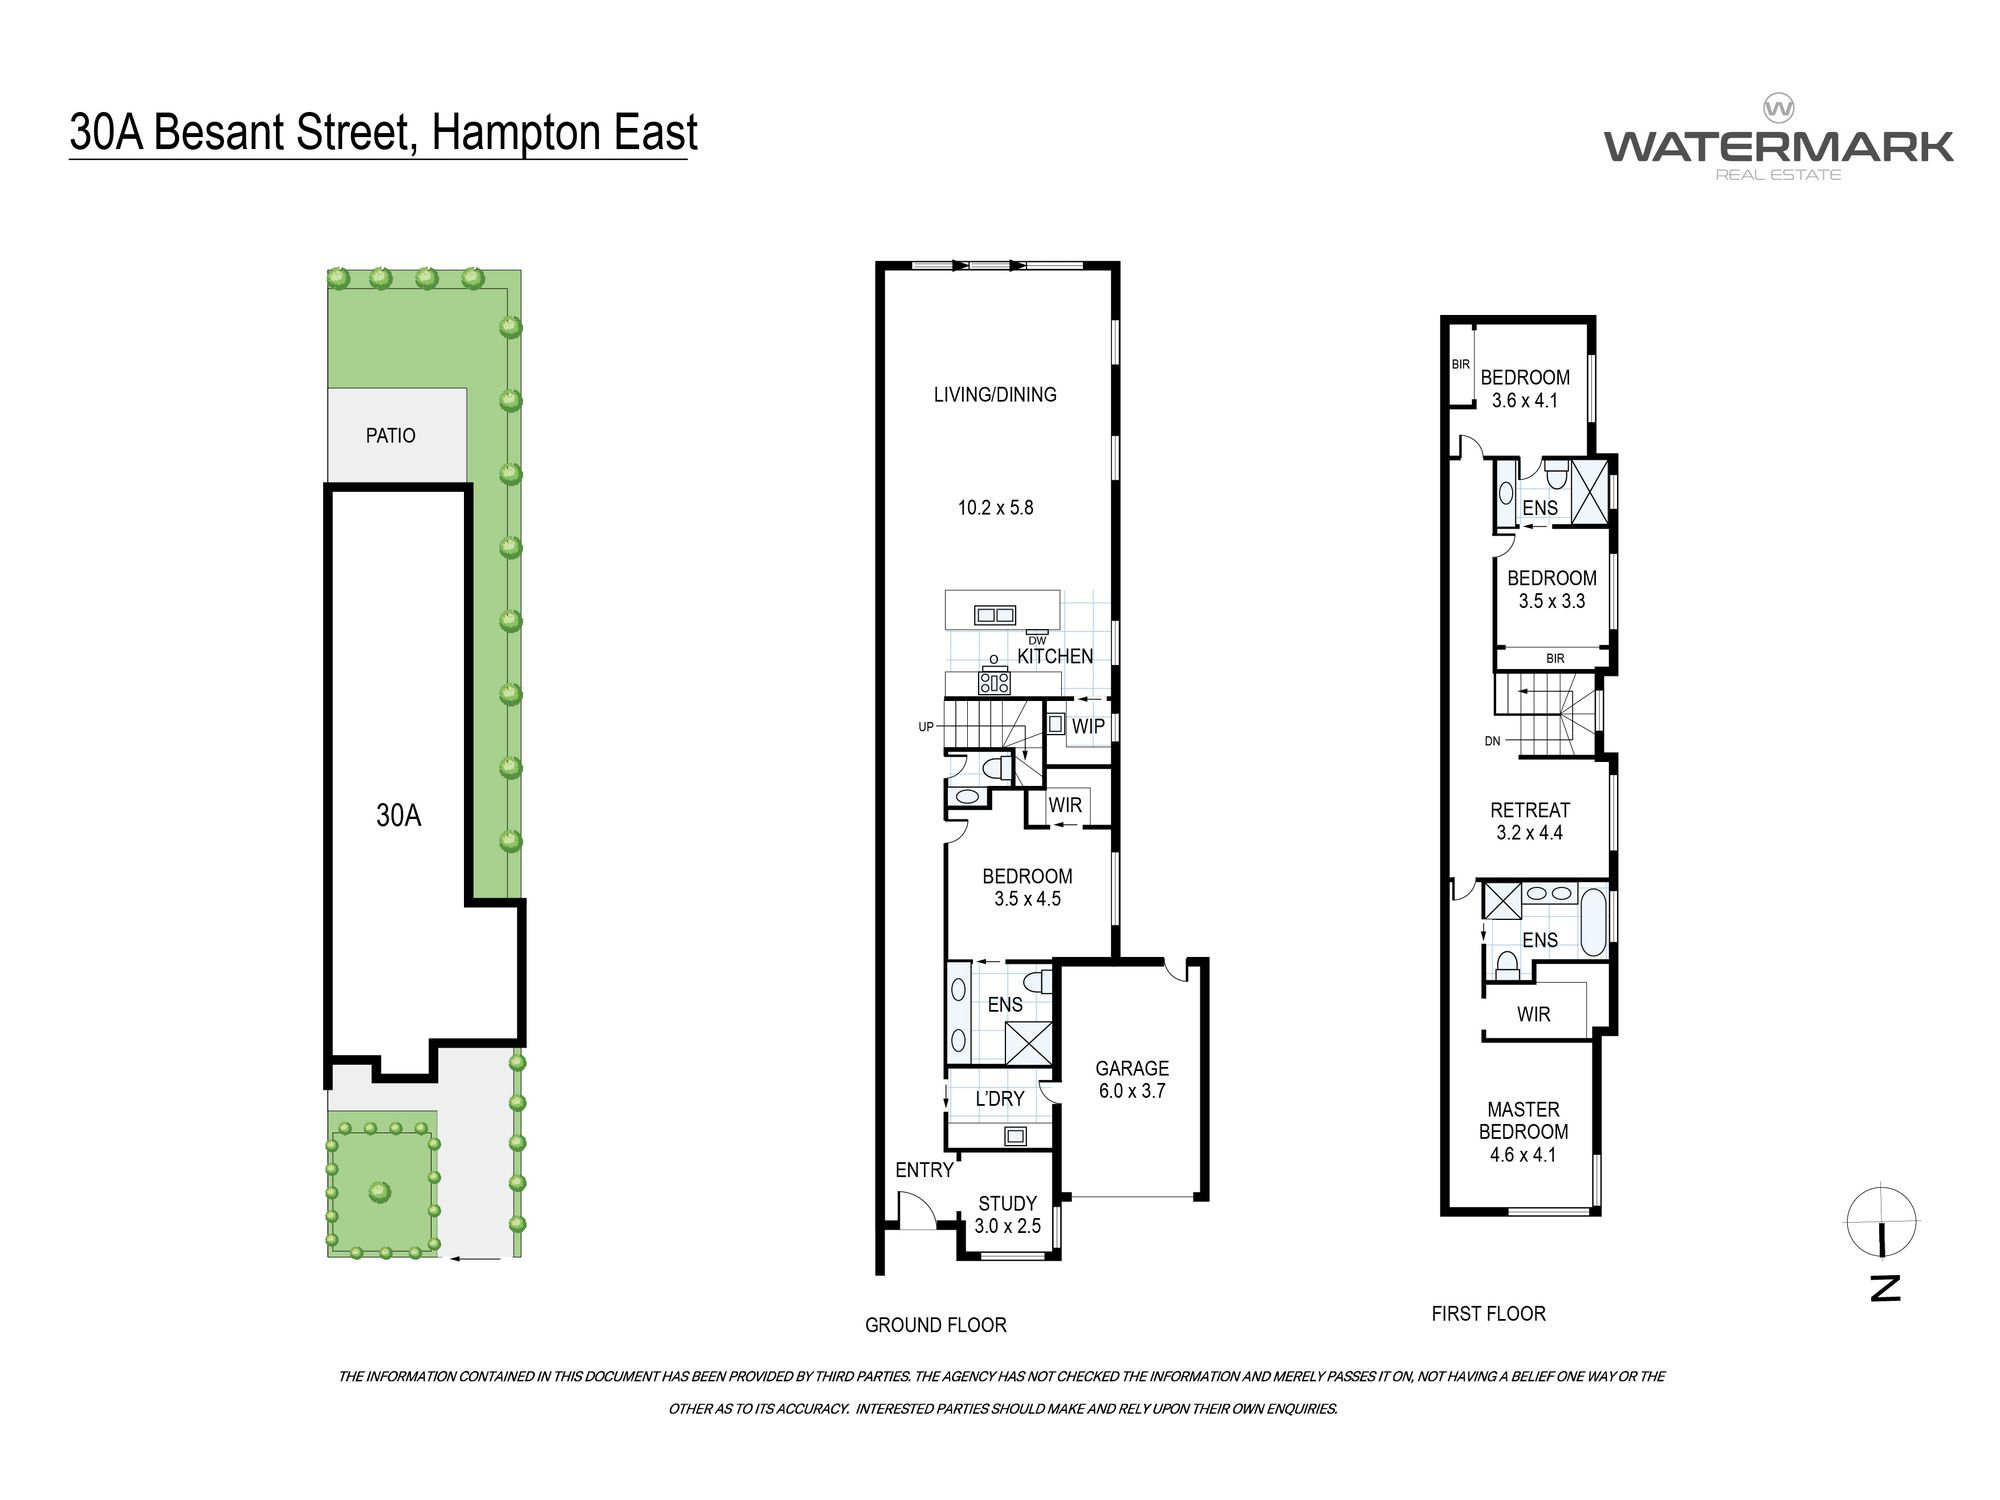 30A Besant Street, Hampton East